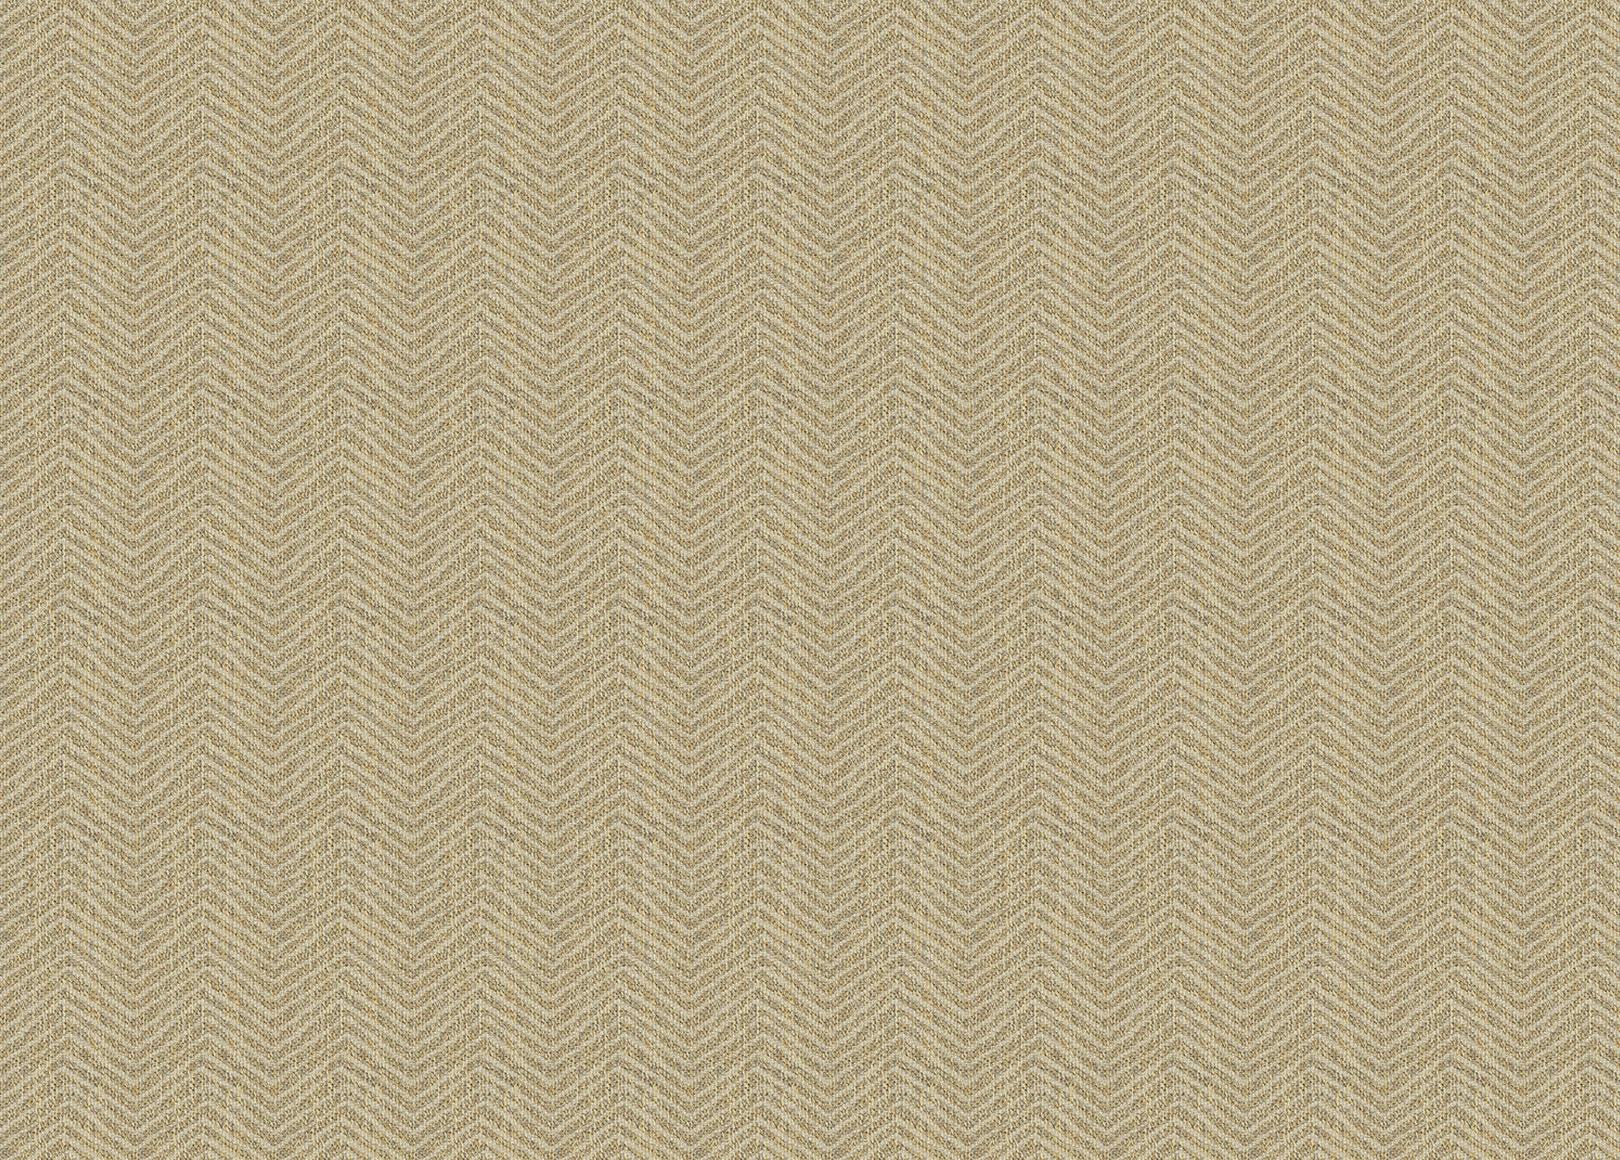 Nevis Wheat Fabric Fabrics Ethan Allen